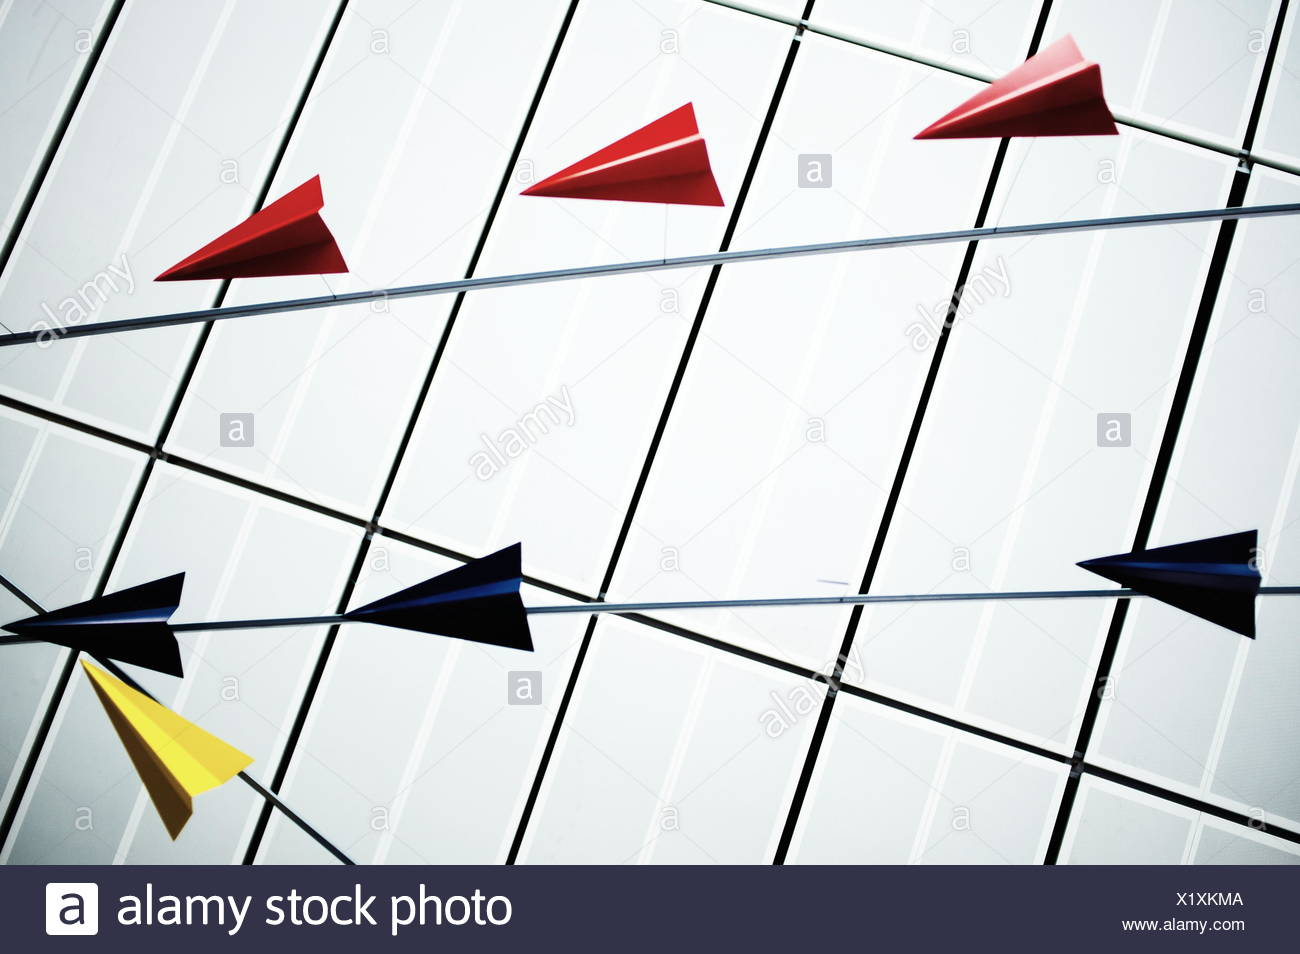 Origami Planes - Stock Image